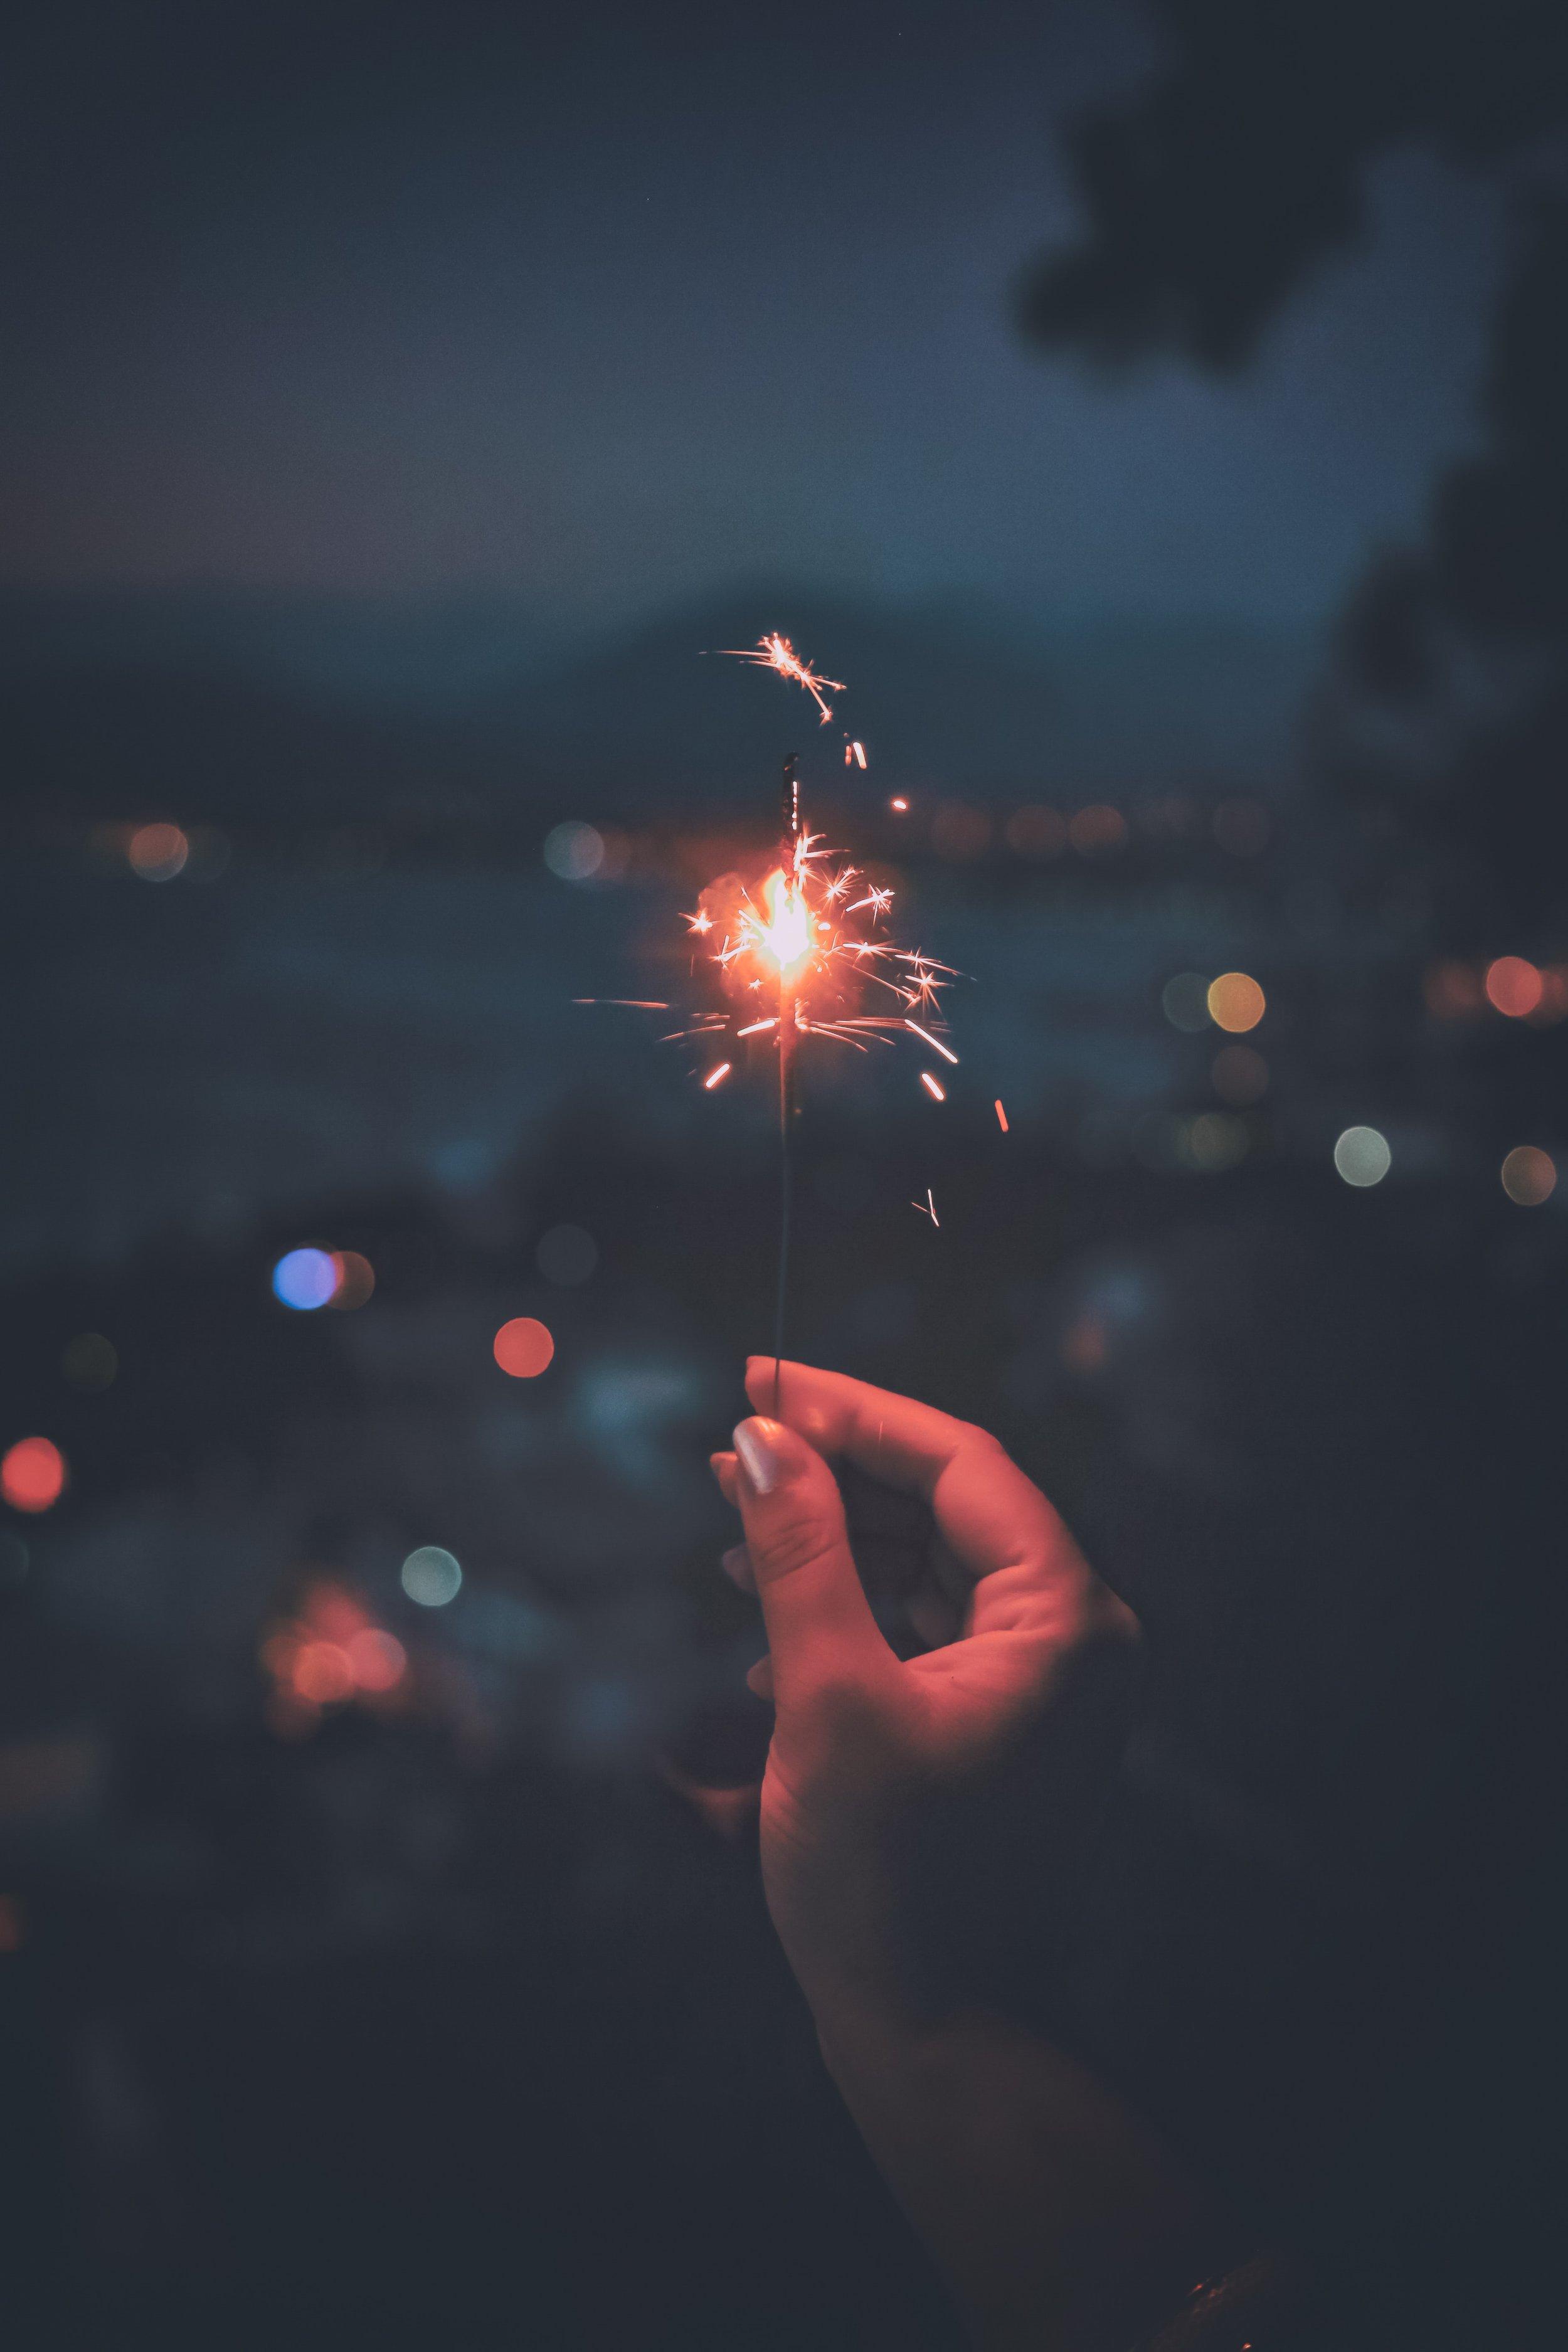 blur-blurred-background-celebrate-2223049.jpg